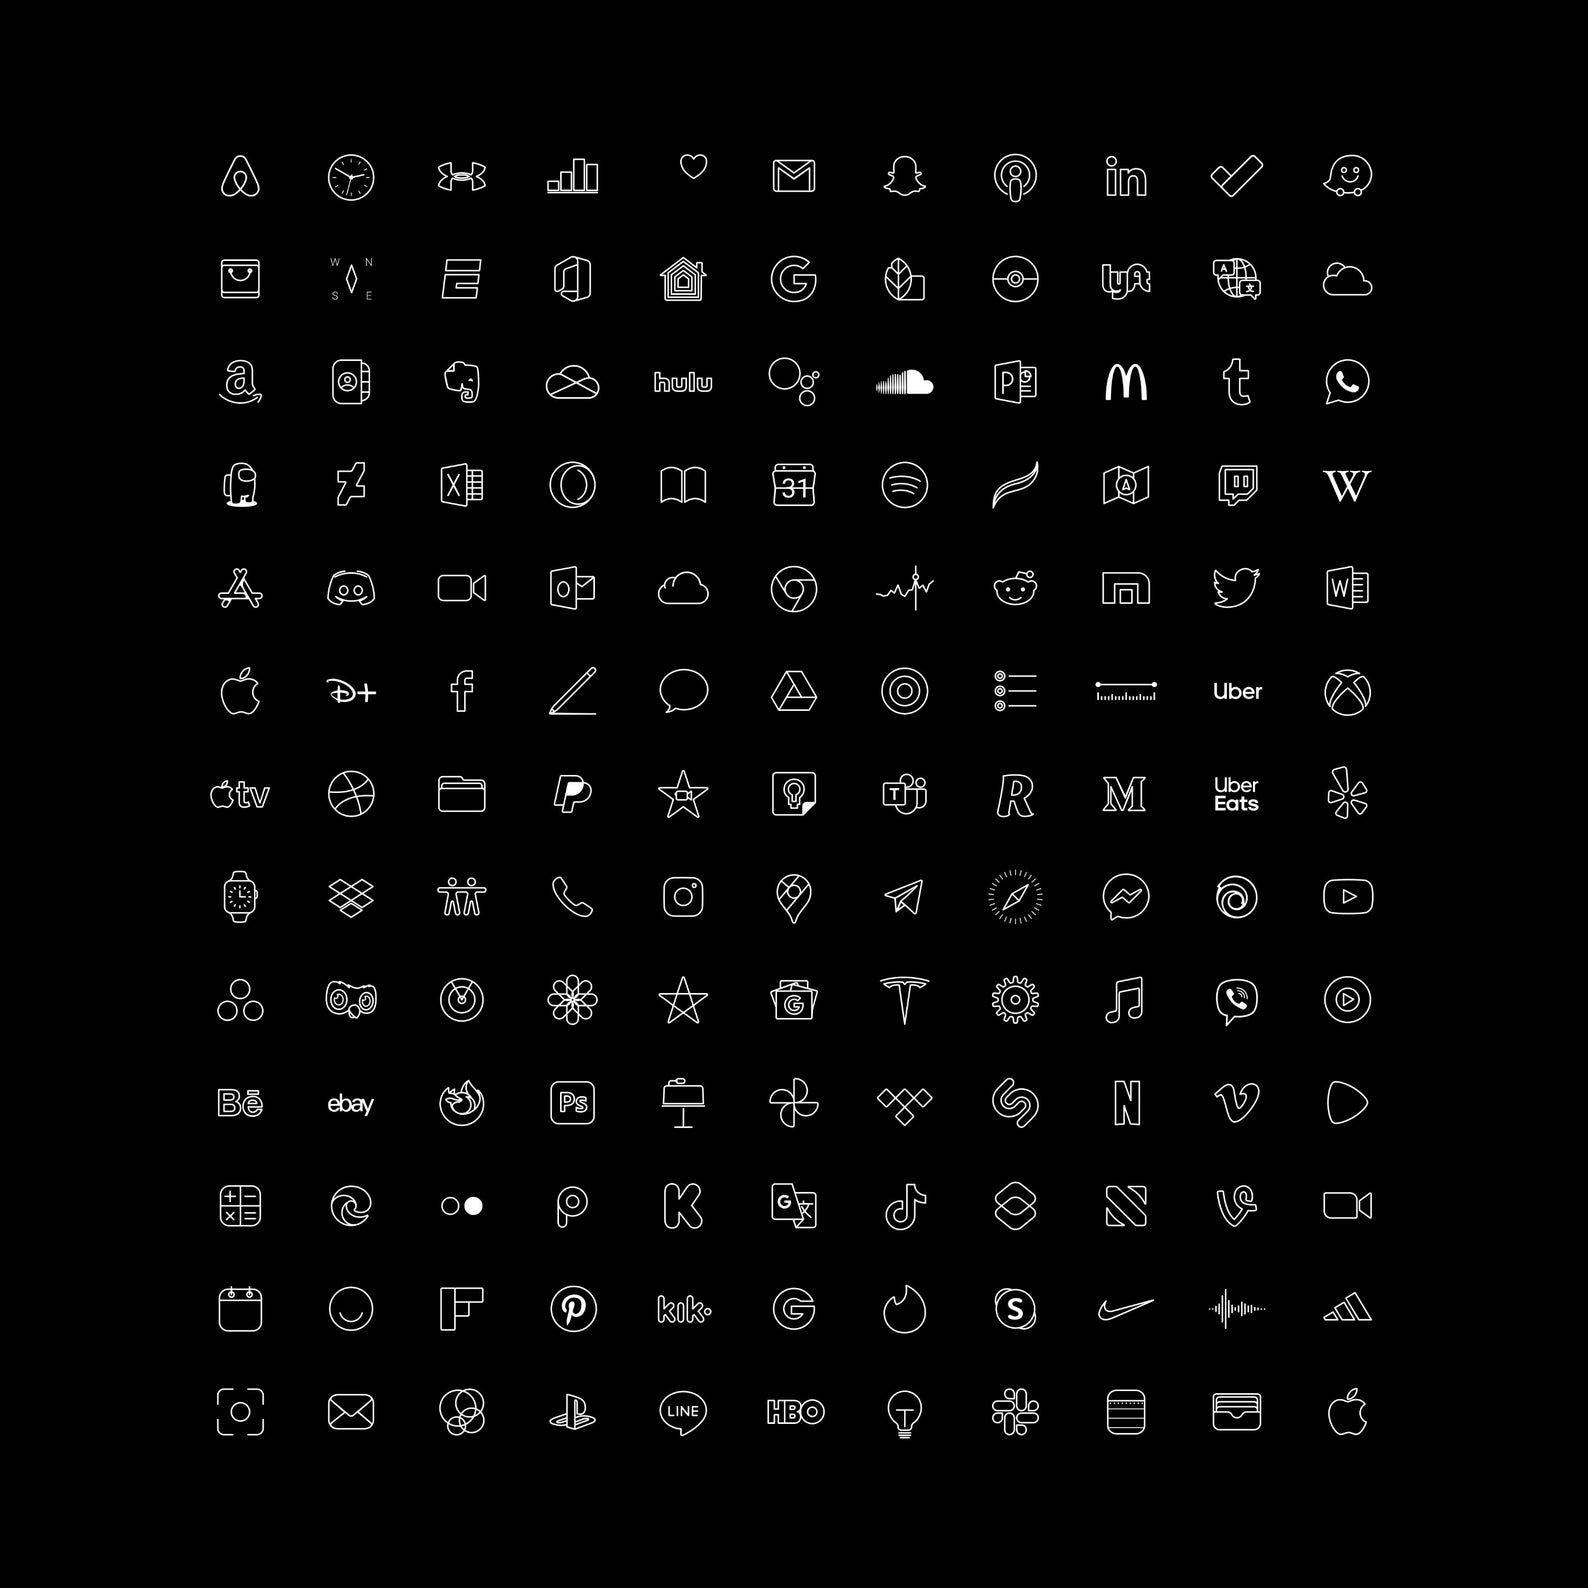 140+ Professional iOS Dark Black and White icon se